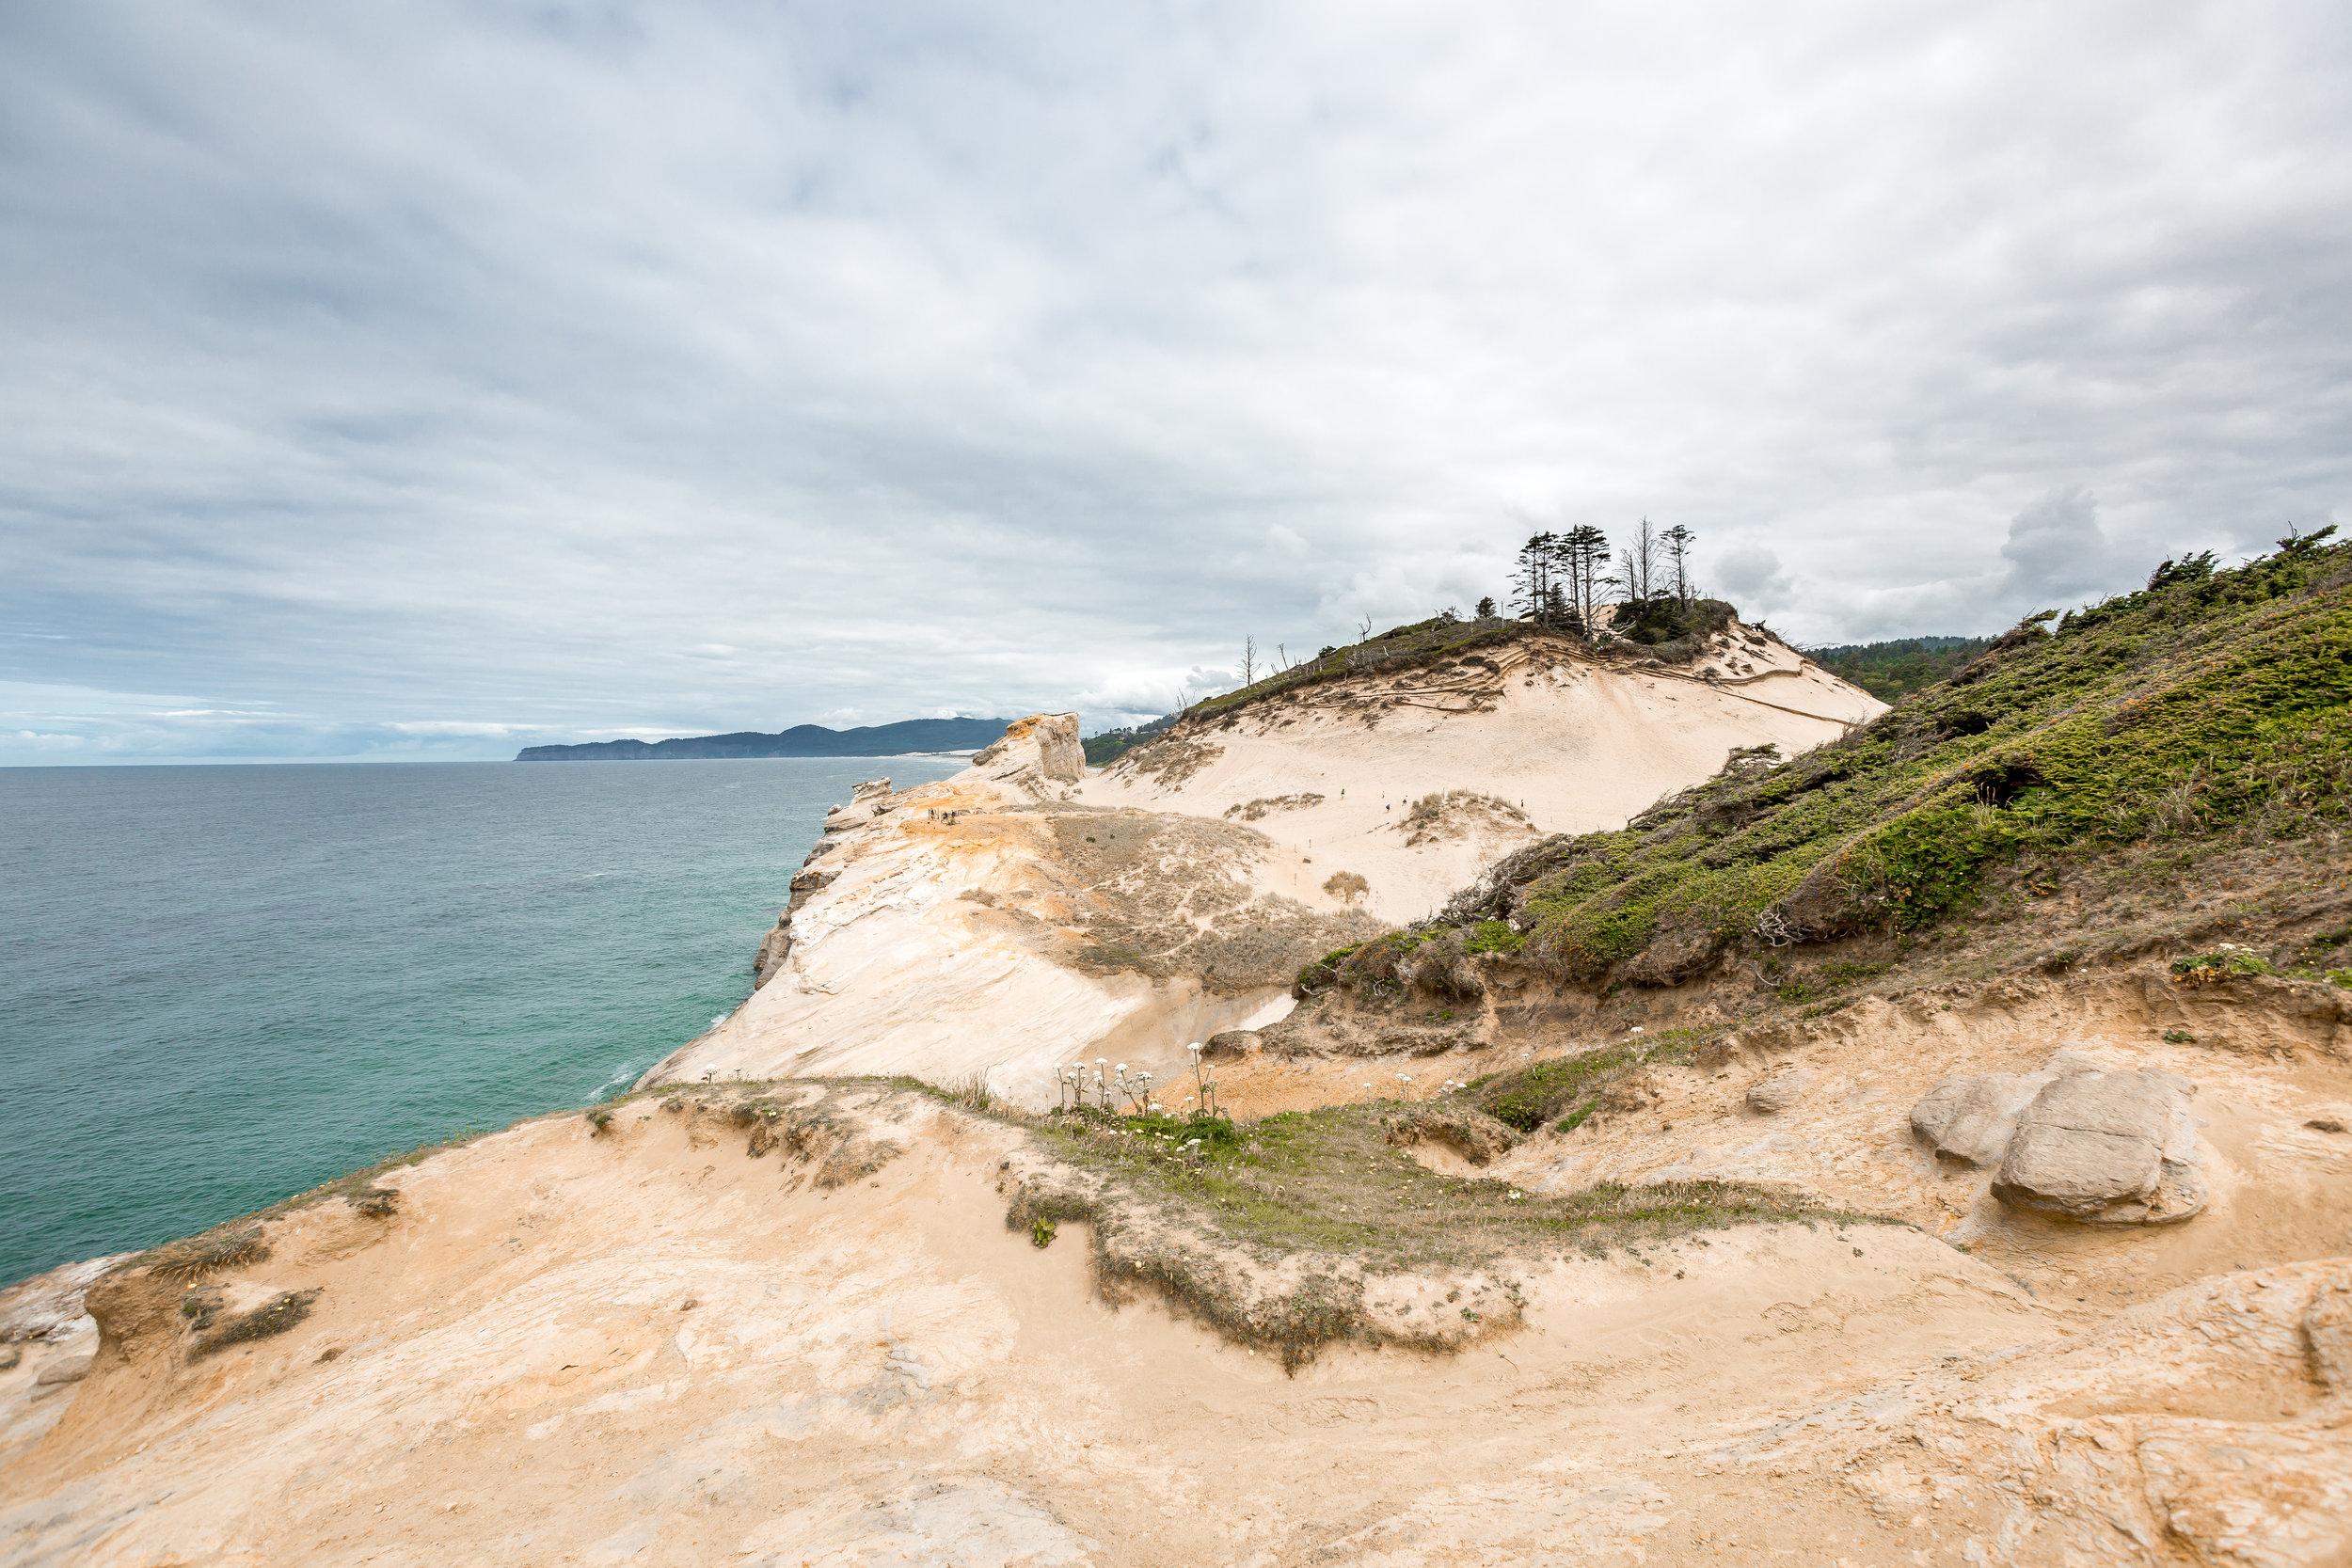 nicole-daacke-photography-oregon-coast-landscapes-elopement-photographer-wedding-photography-adventure-lifestyle-roadtrip-along-oregon-coast-cape-kiwanda-oceanside-beach-cannon-beach-oregon-pnw-3.jpg